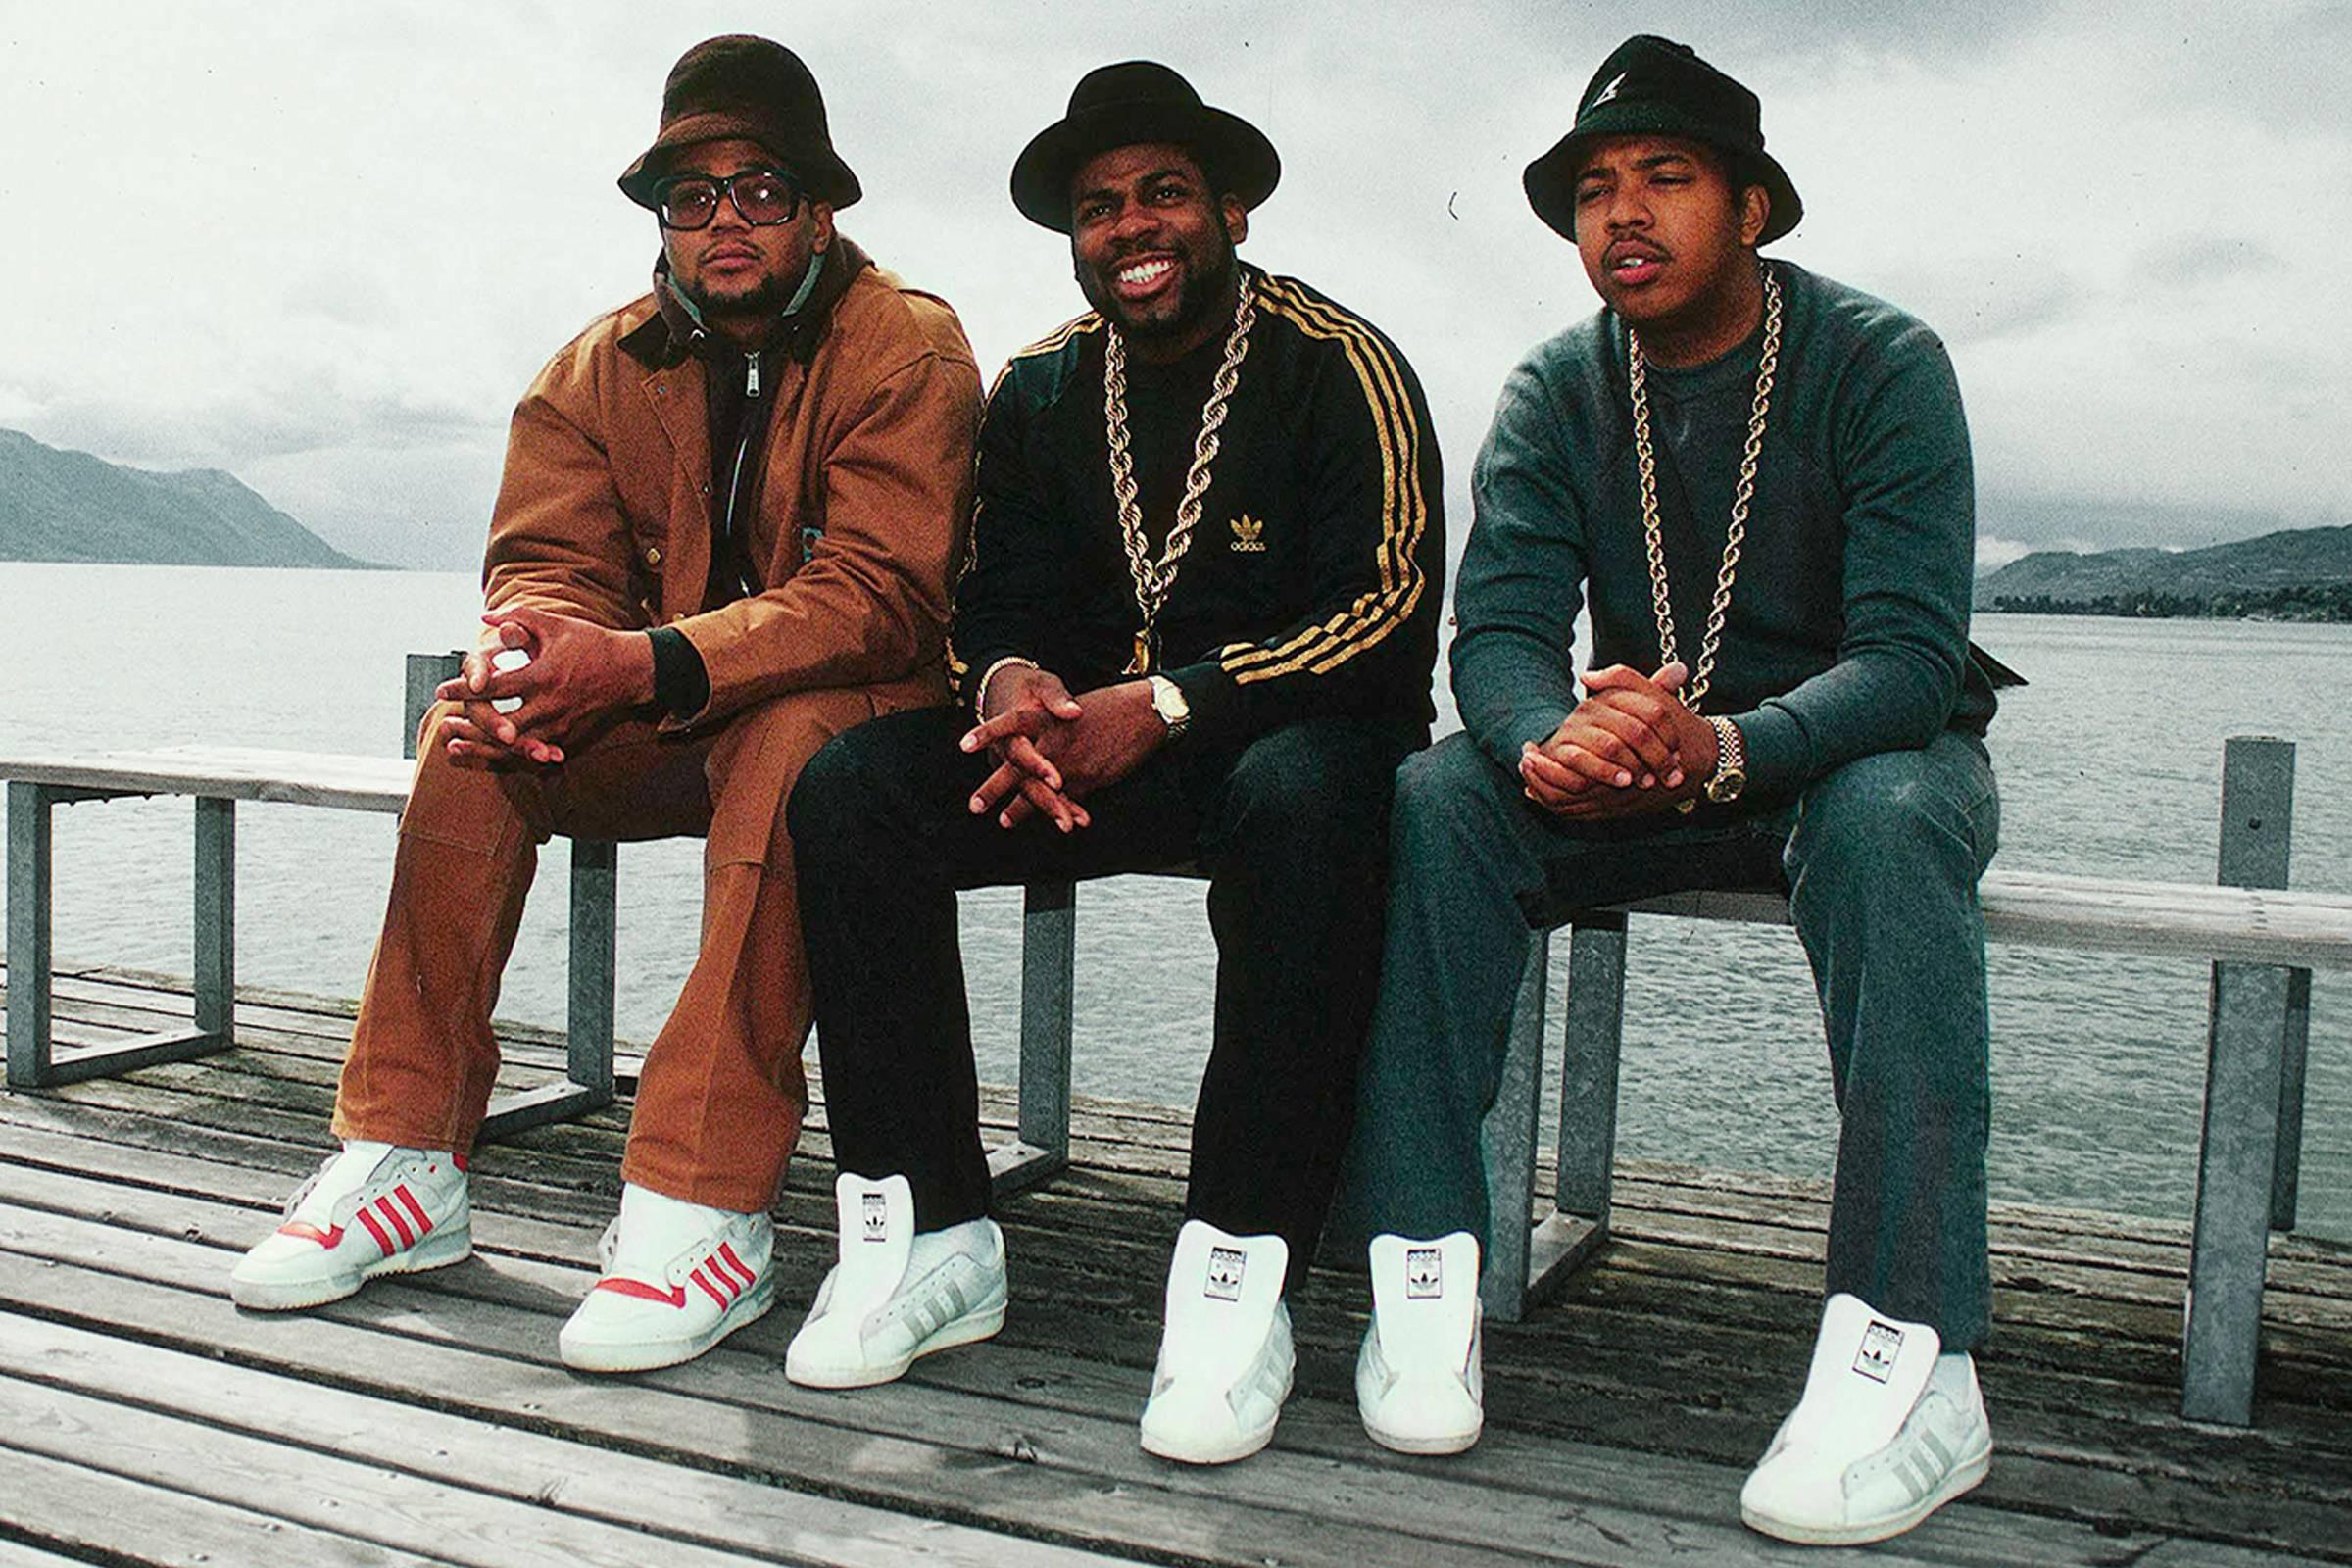 Hip-hop group Run-D.M.C. popularised the Superstar